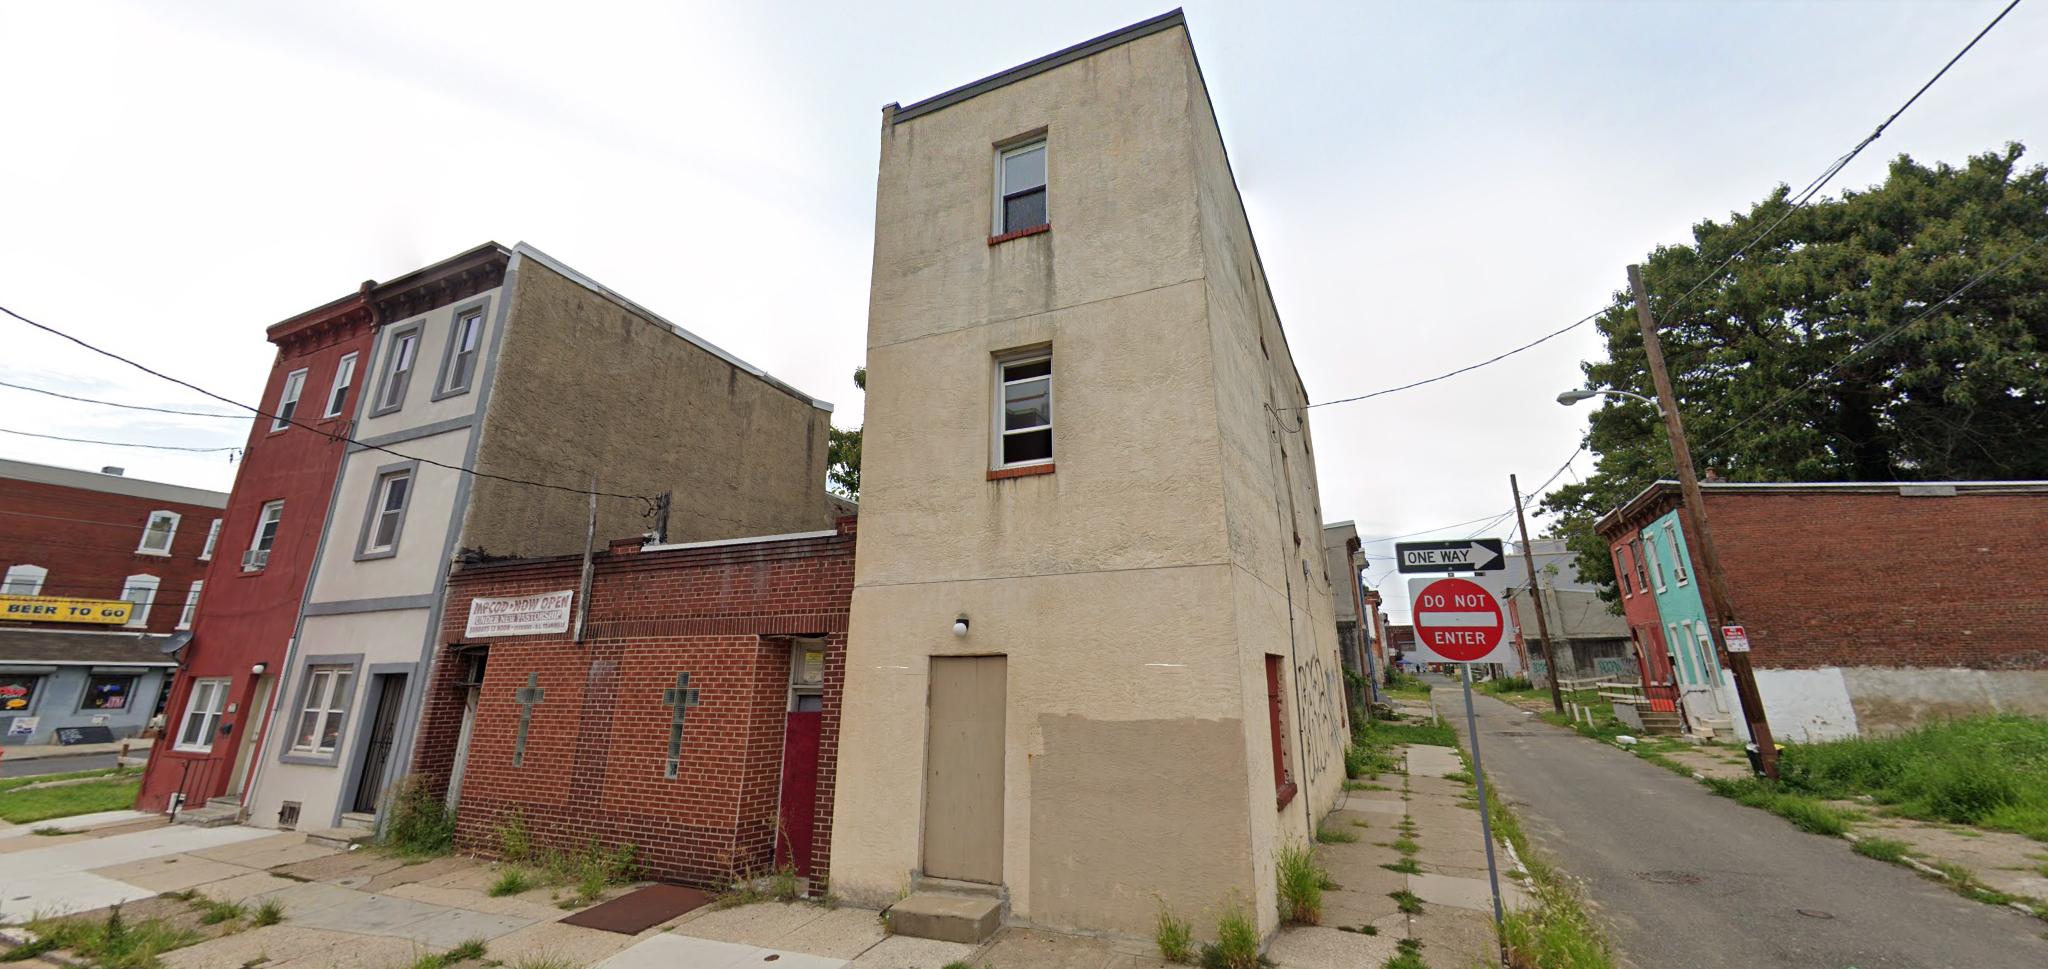 Former view of 809 Diamond Street. Credit: Google.